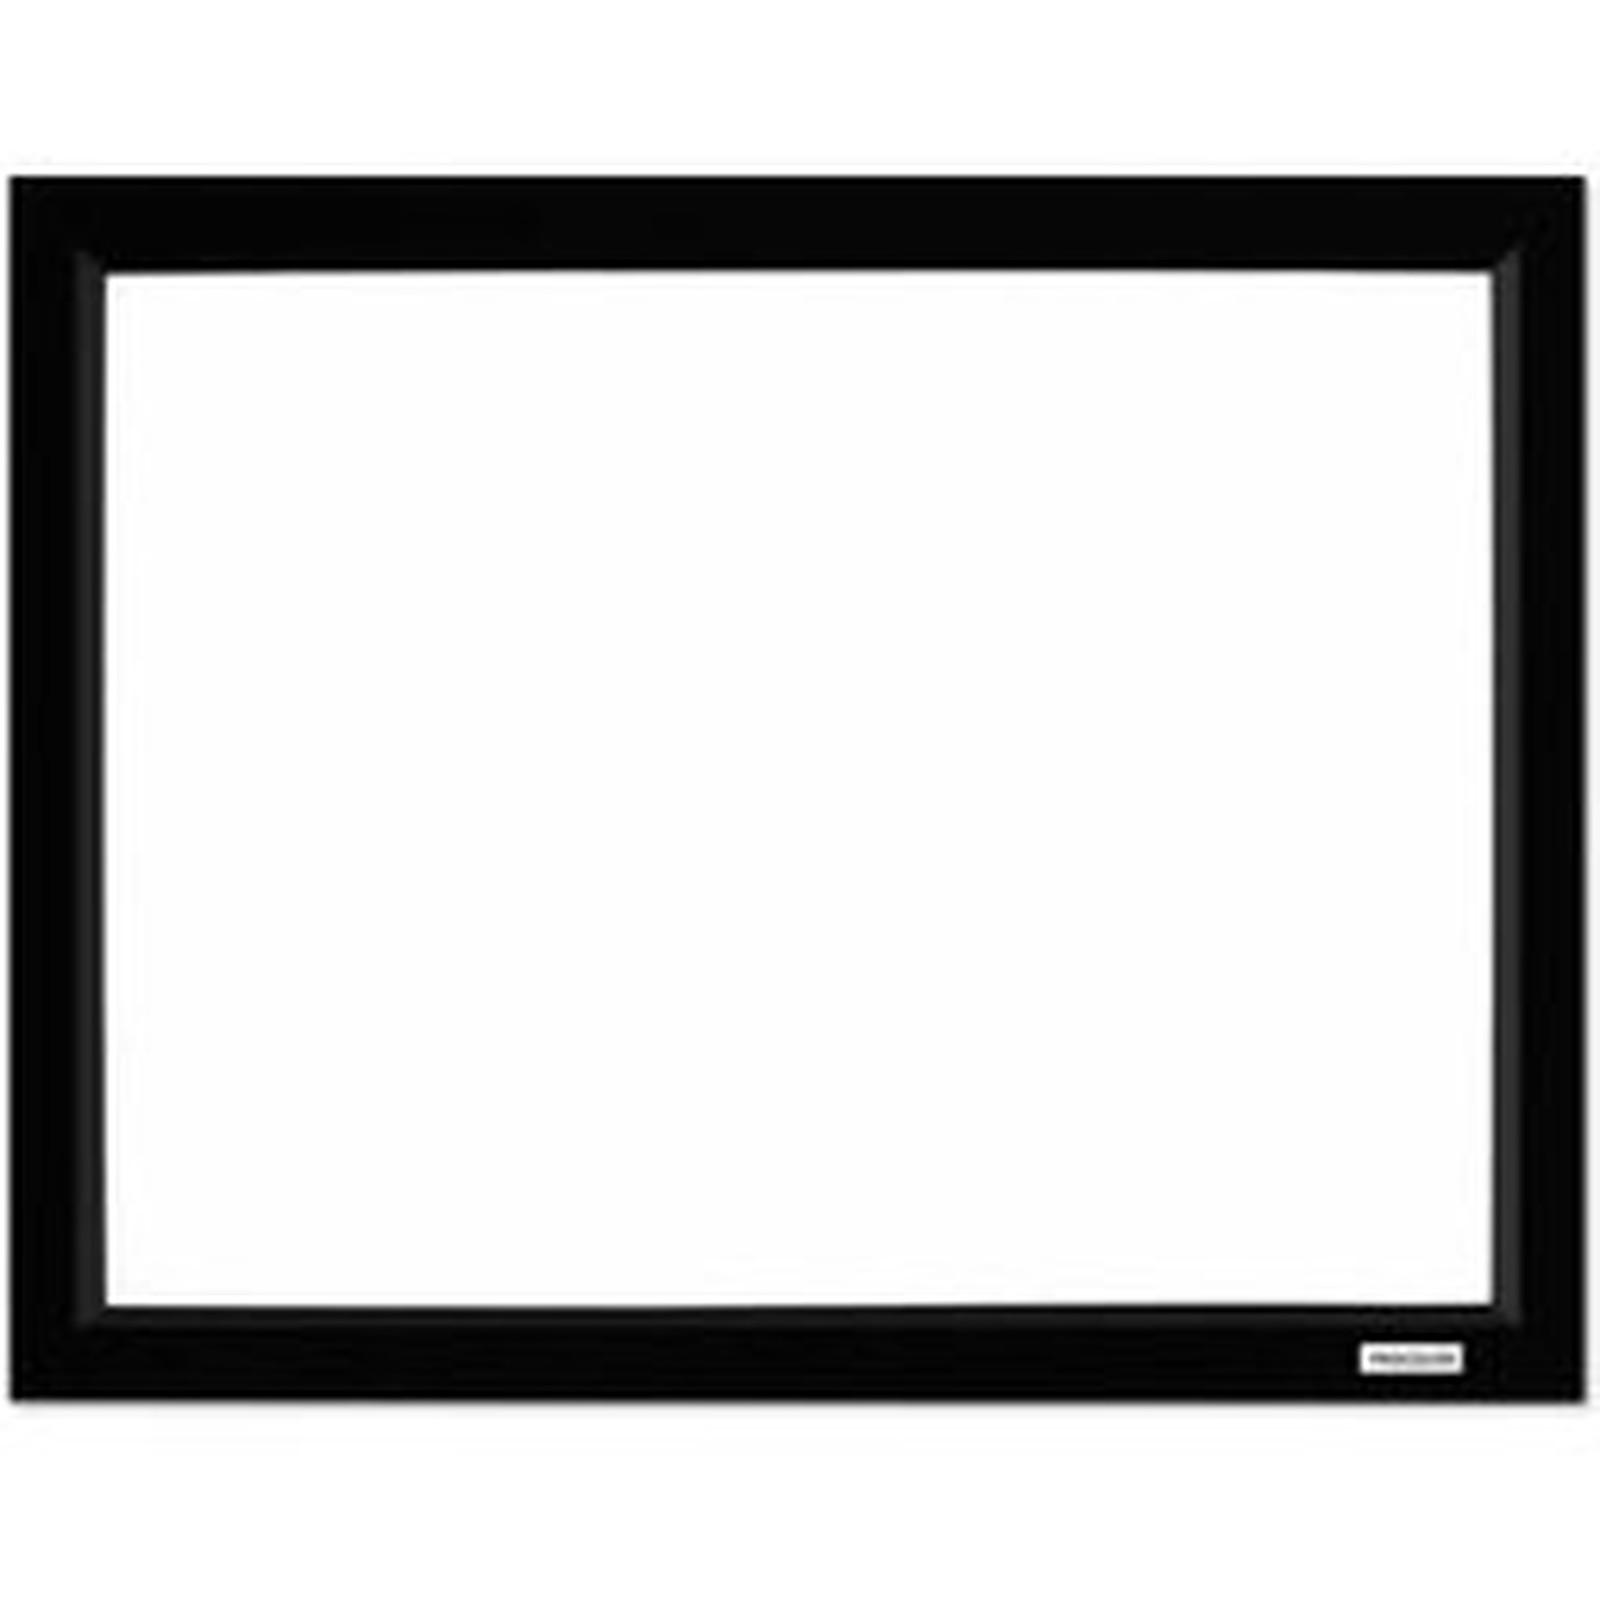 Procolor HOME-SCREEN Deluxe - Ecran cadre - Format 16:9 - 216x128 cm